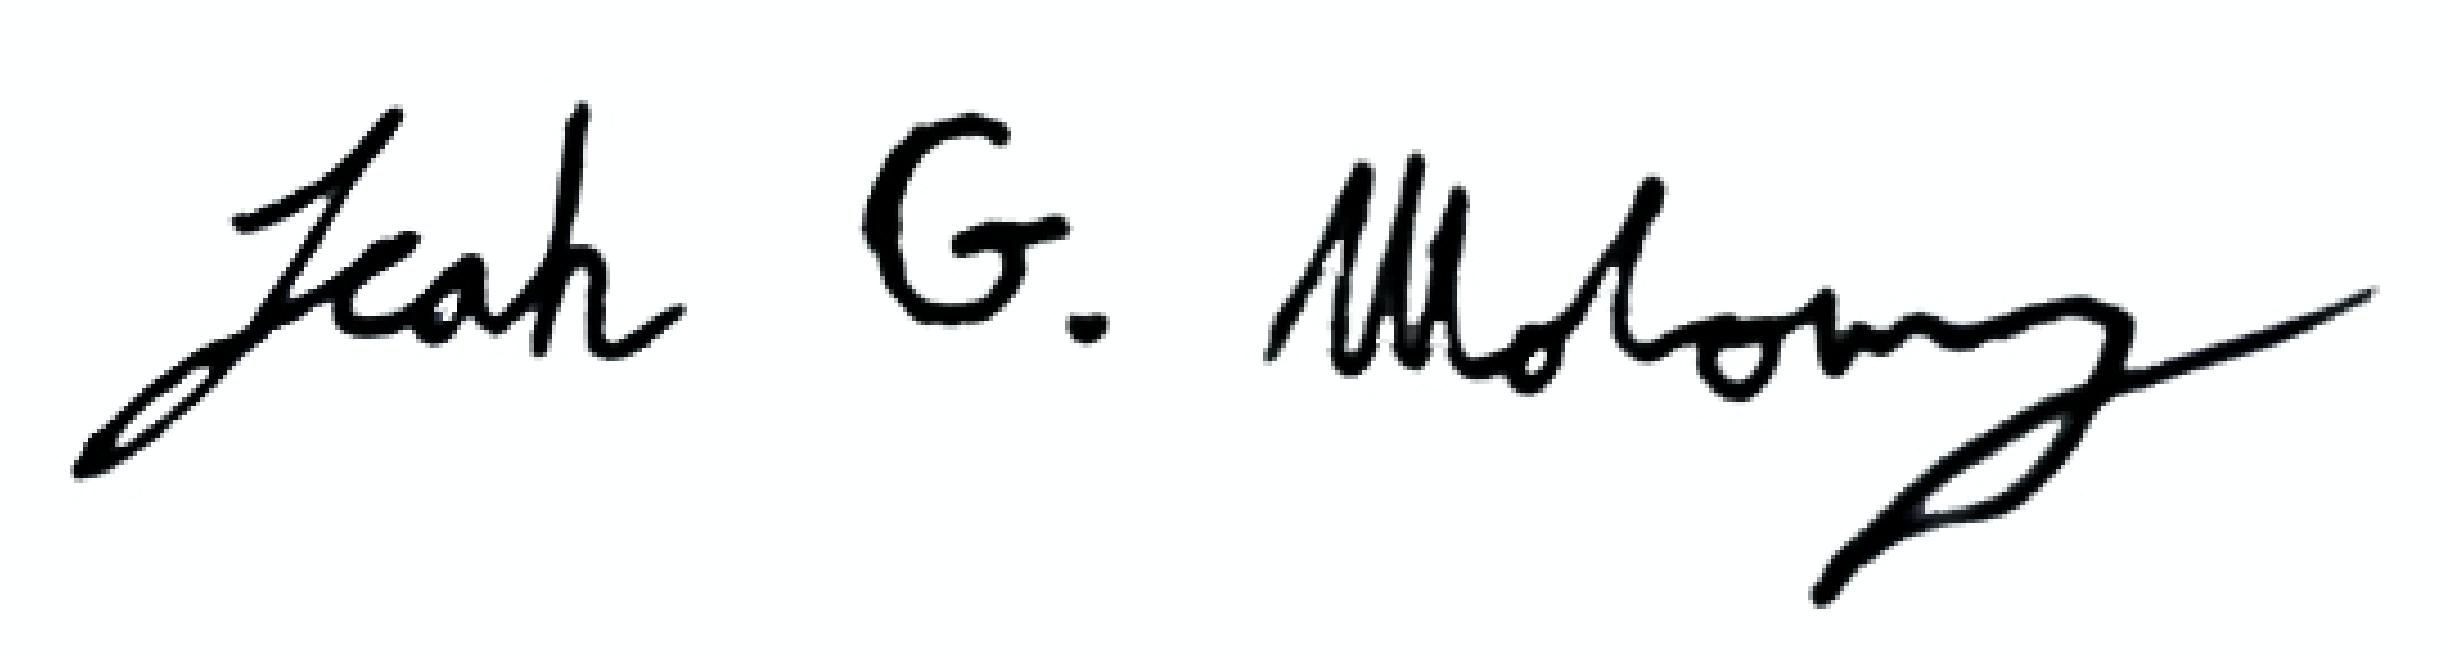 Leah Moloney's Signature